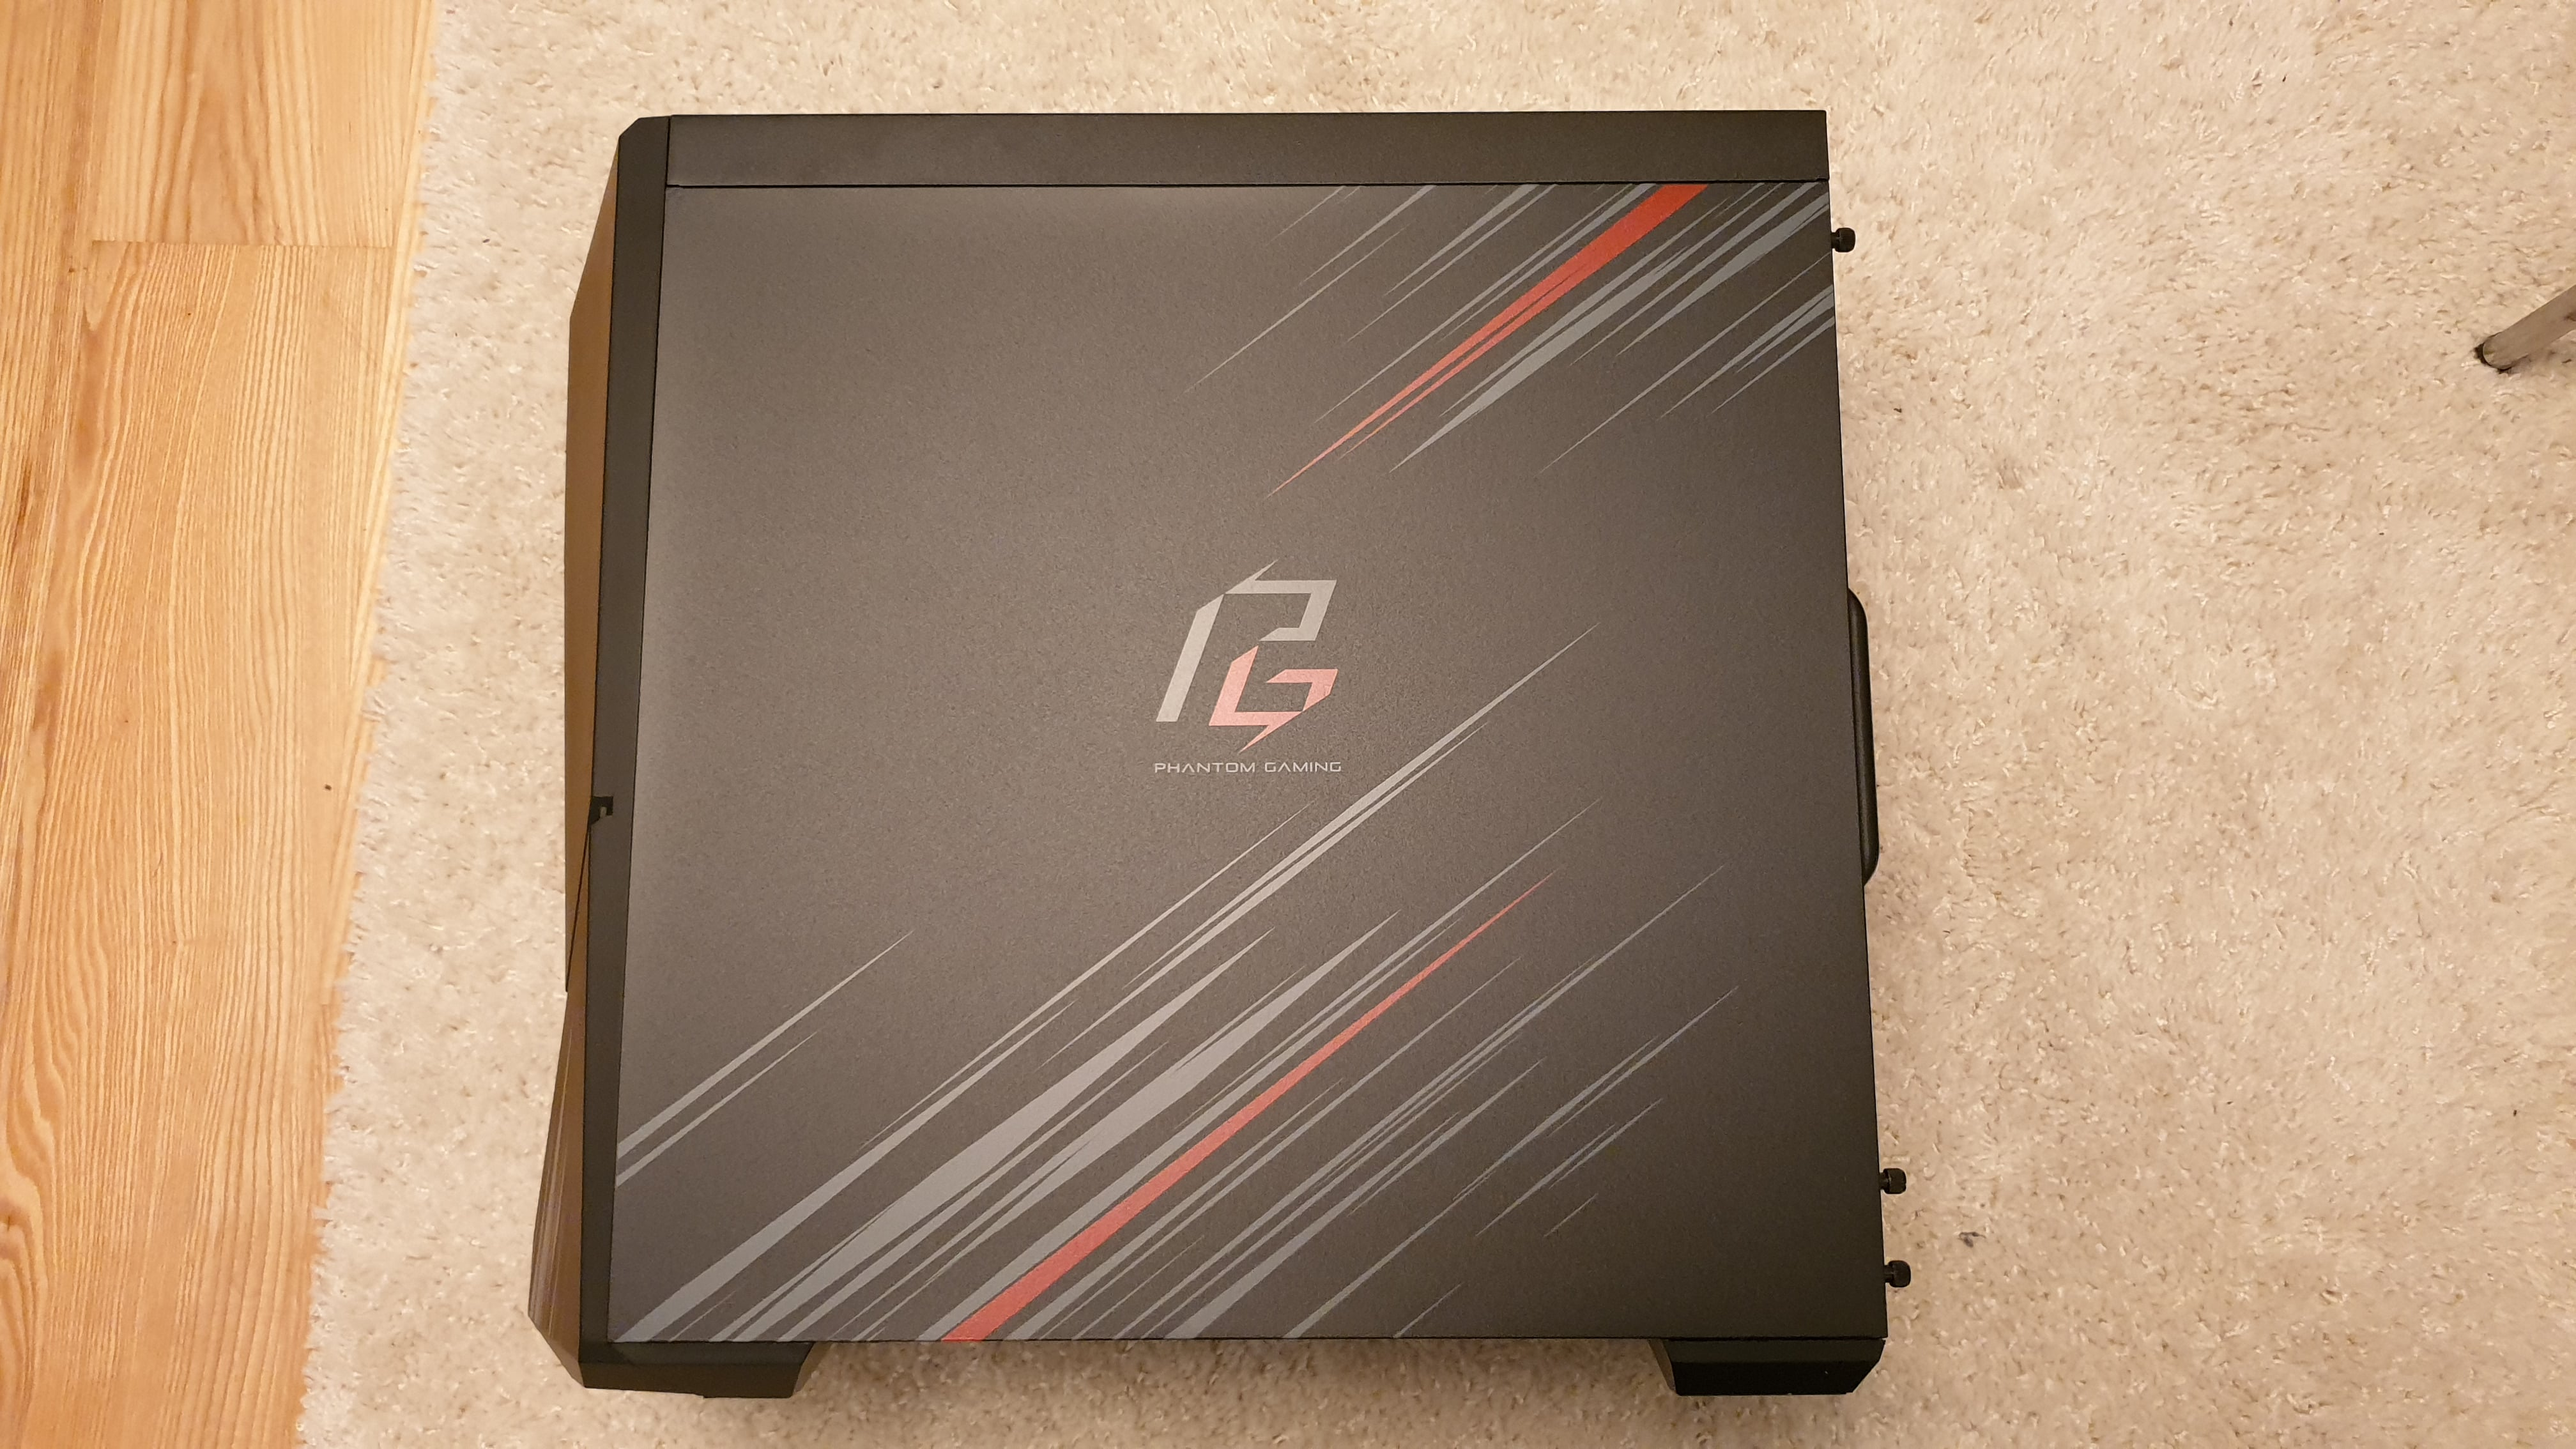 Test obudowy Cooler Master MasterBox K500 Phantom Gaming Edition - tak długa nazwa musi zwiastować cuda? 21